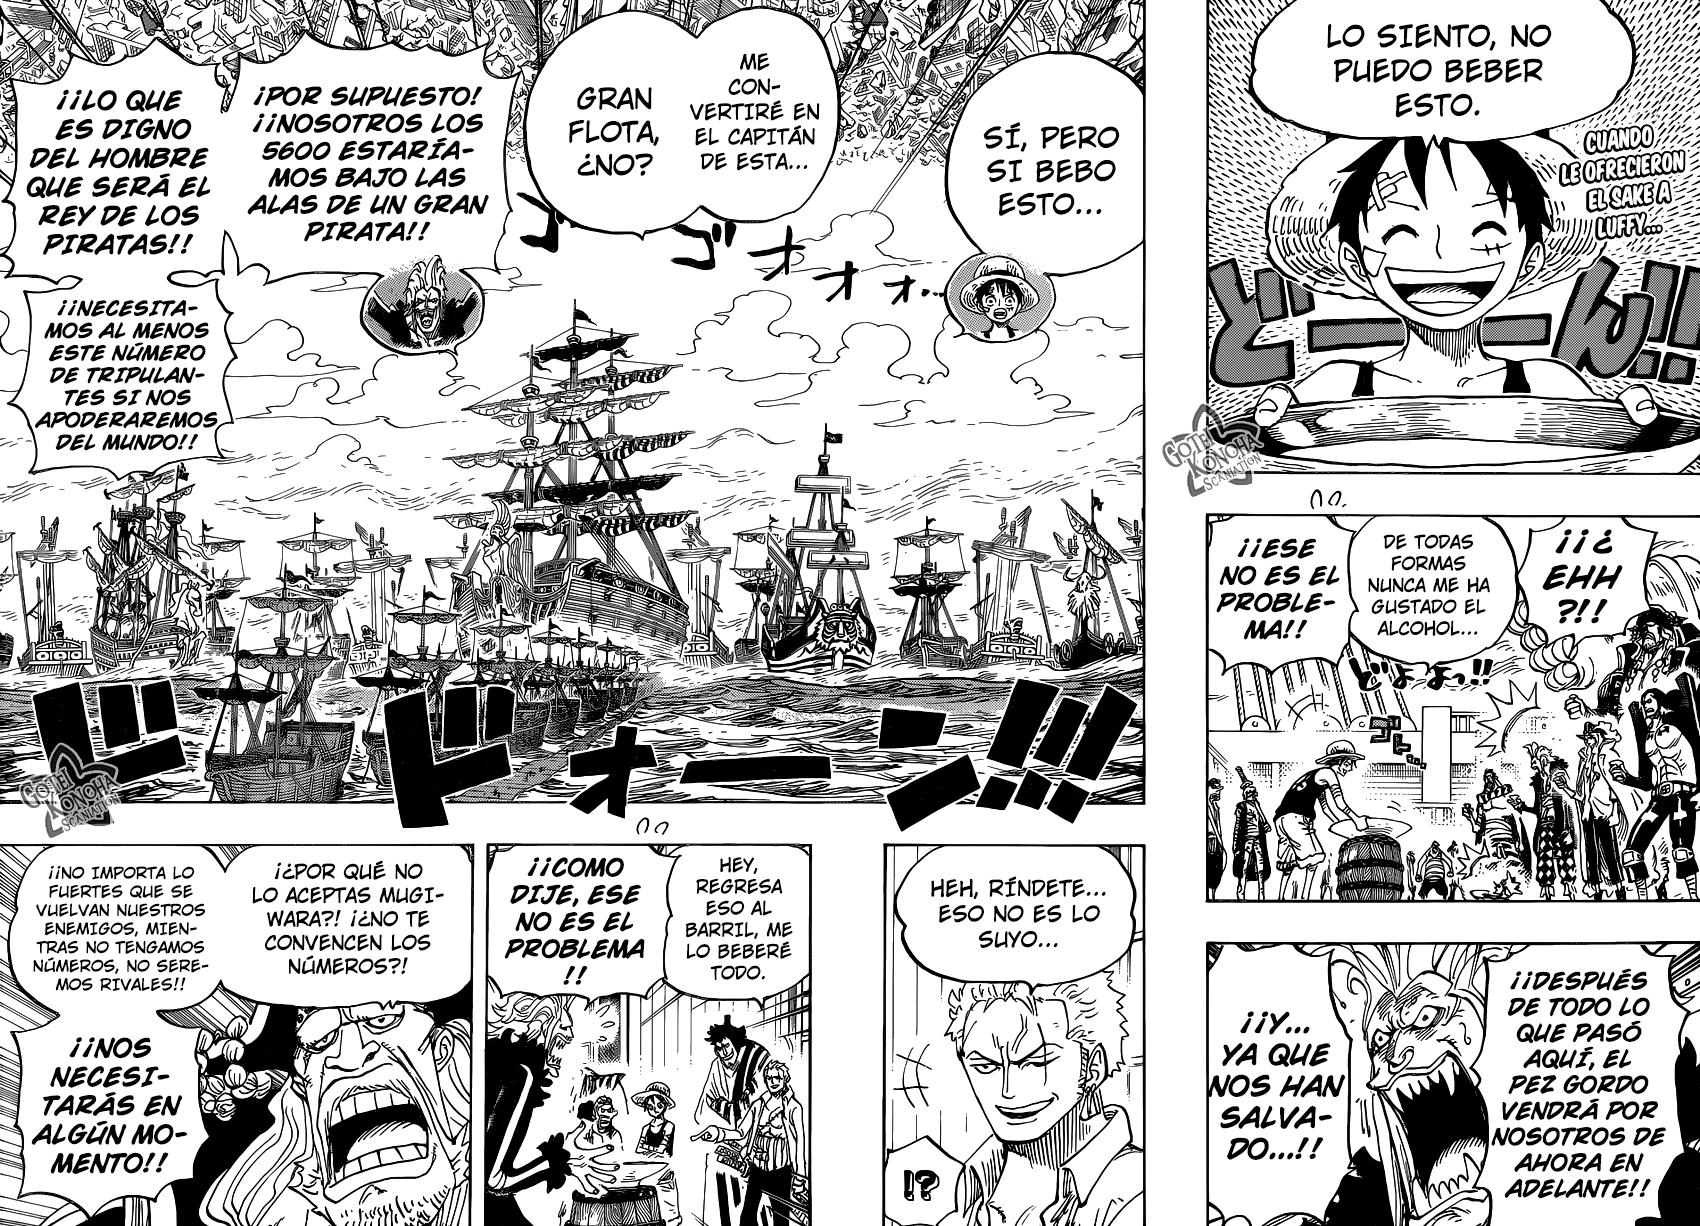 http://c5.ninemanga.com/es_manga/50/114/416254/94660adf7659580d61a5a858295fb921.jpg Page 3